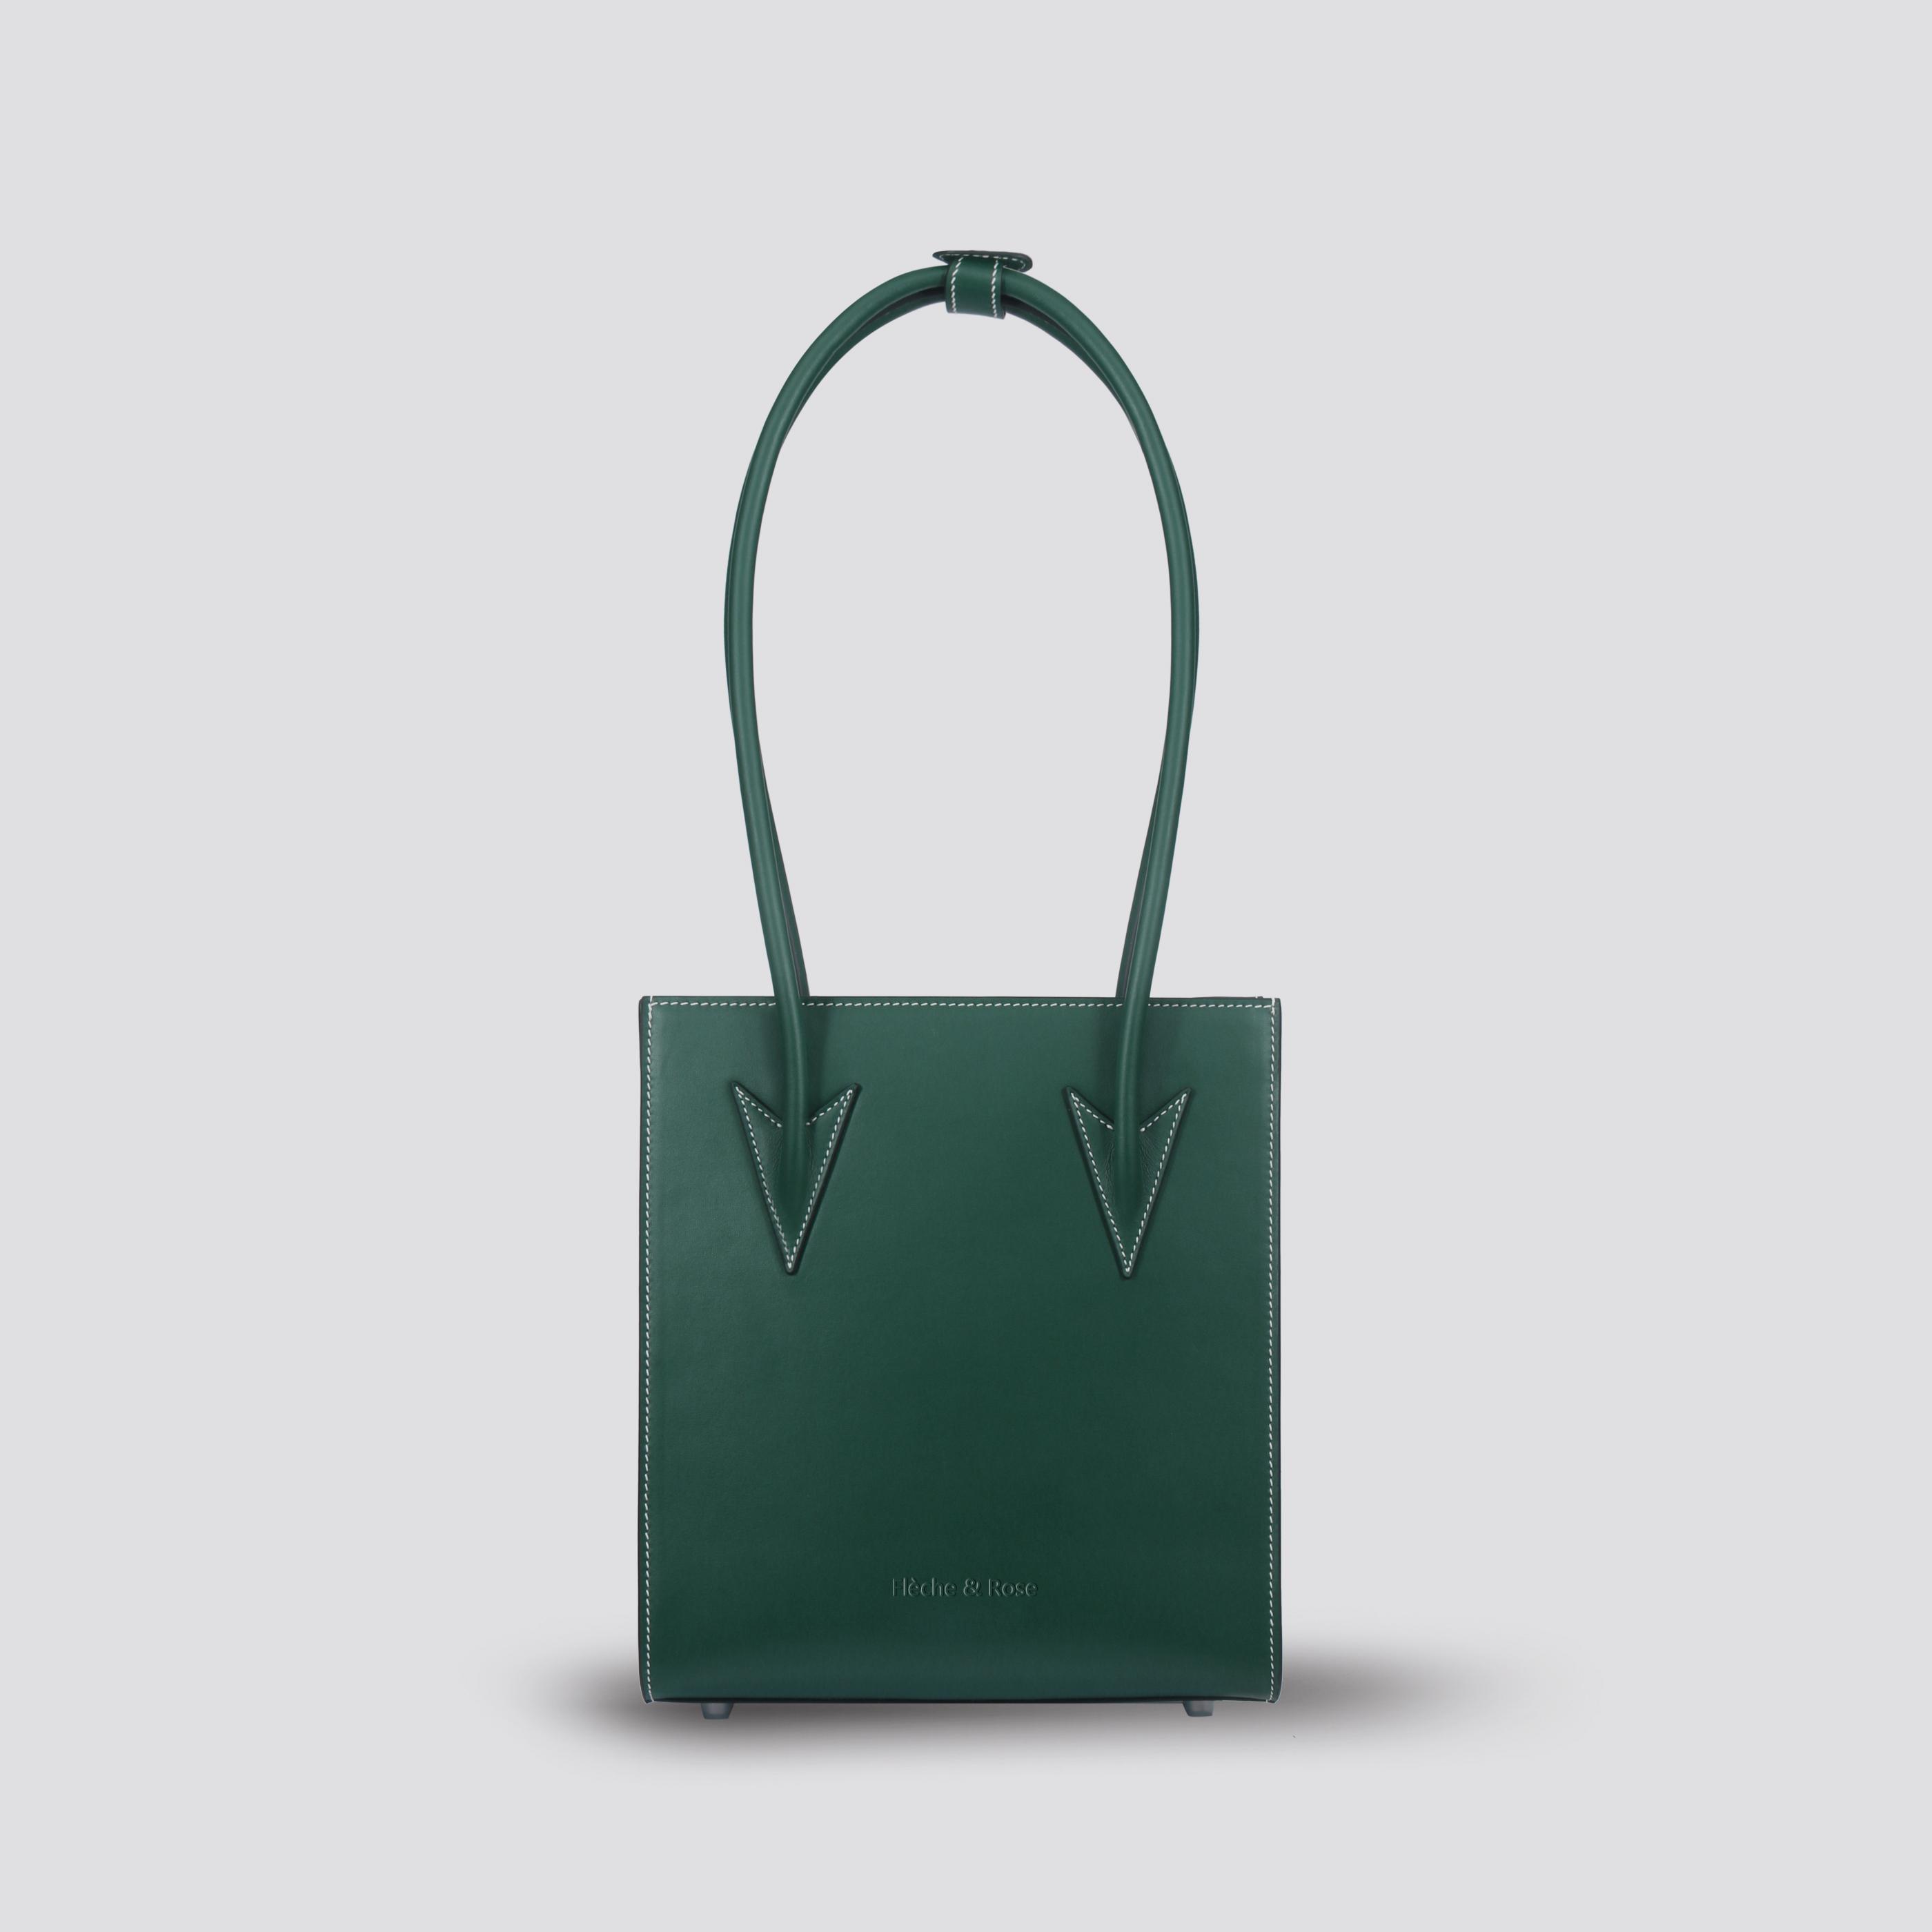 Flecherose arrow long wrist handbag piano score bag vertical casual cowhide underarm bag small green